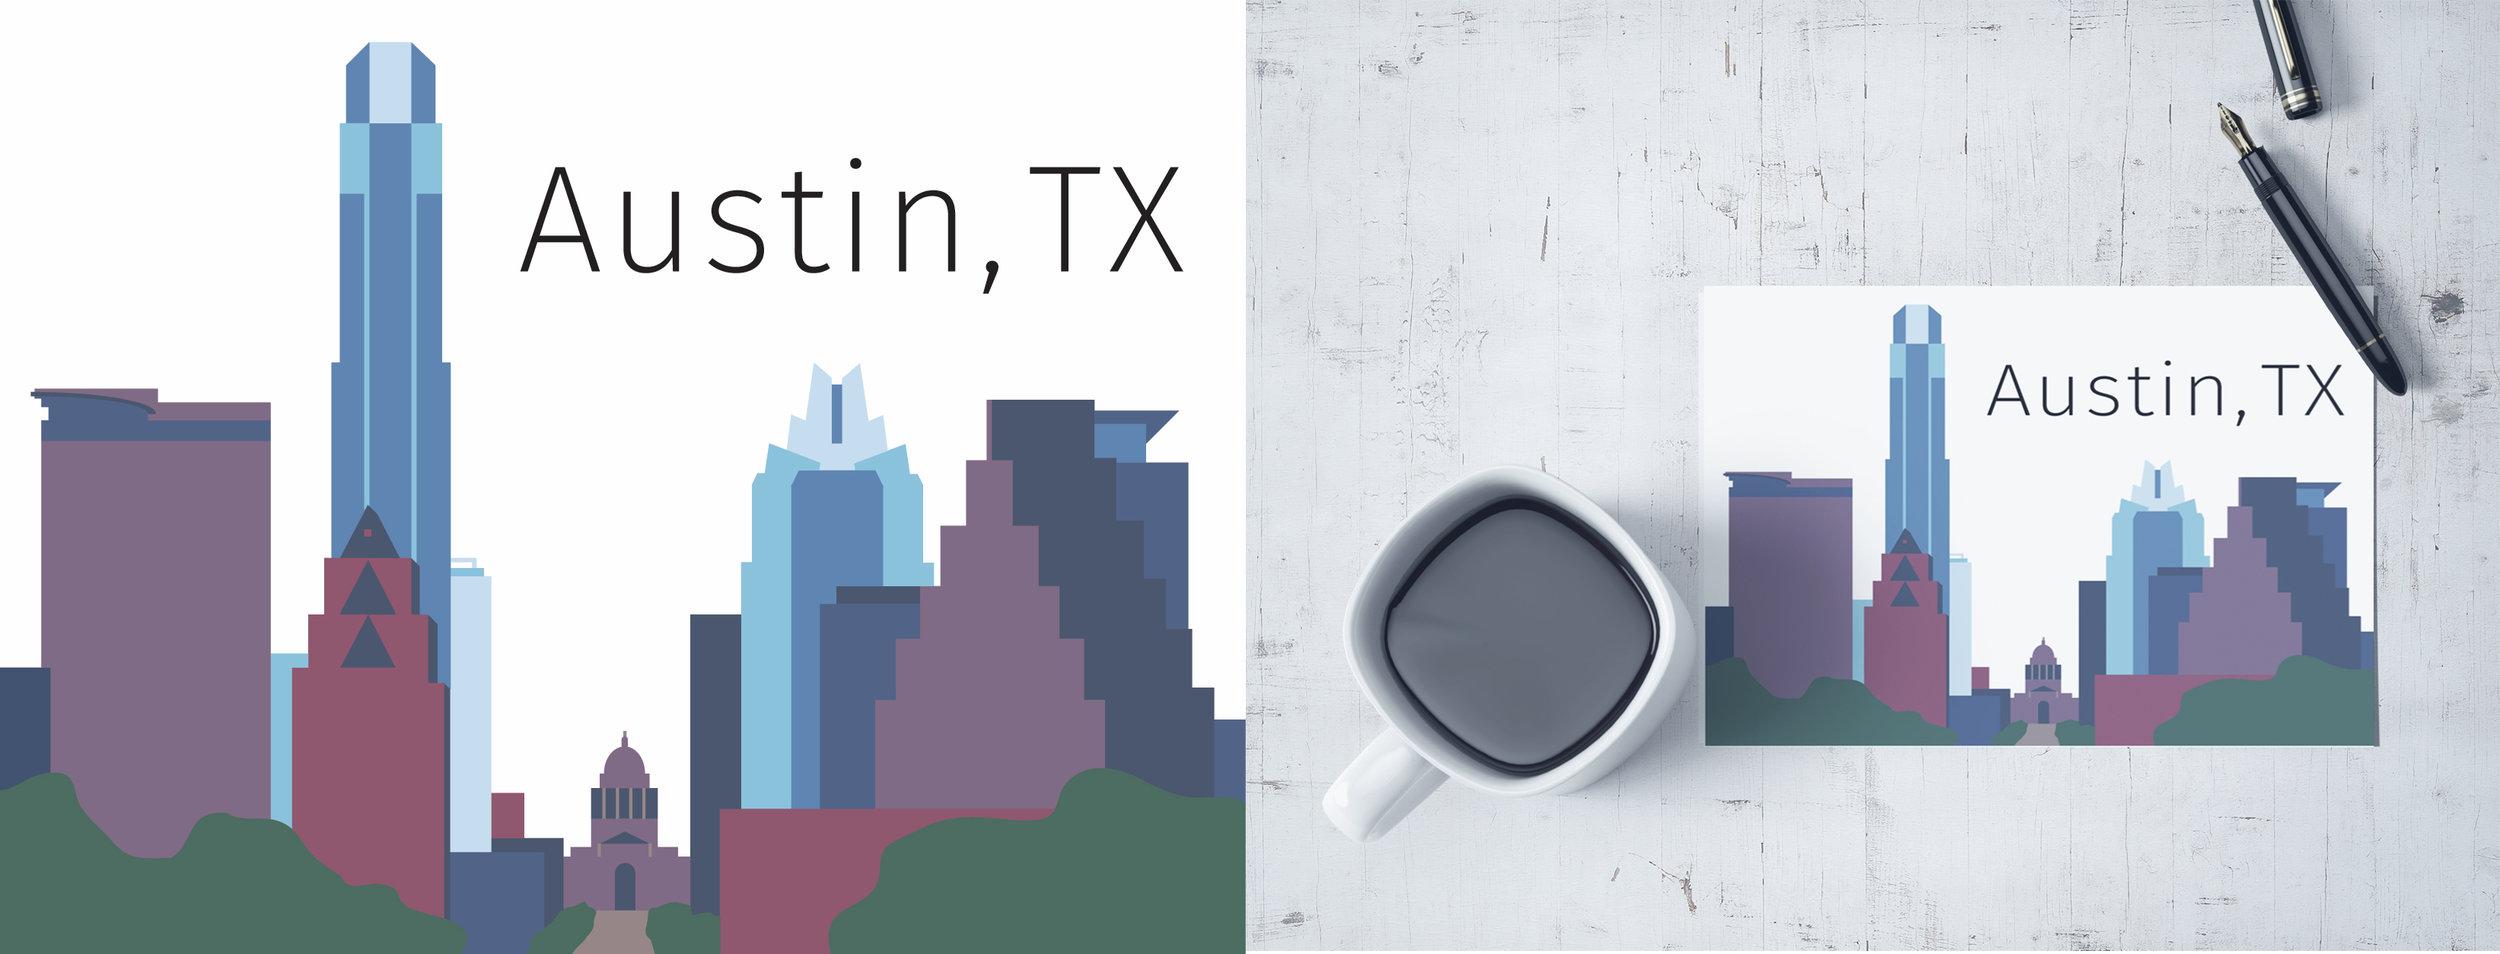 Austin, TX illustrated postcard.